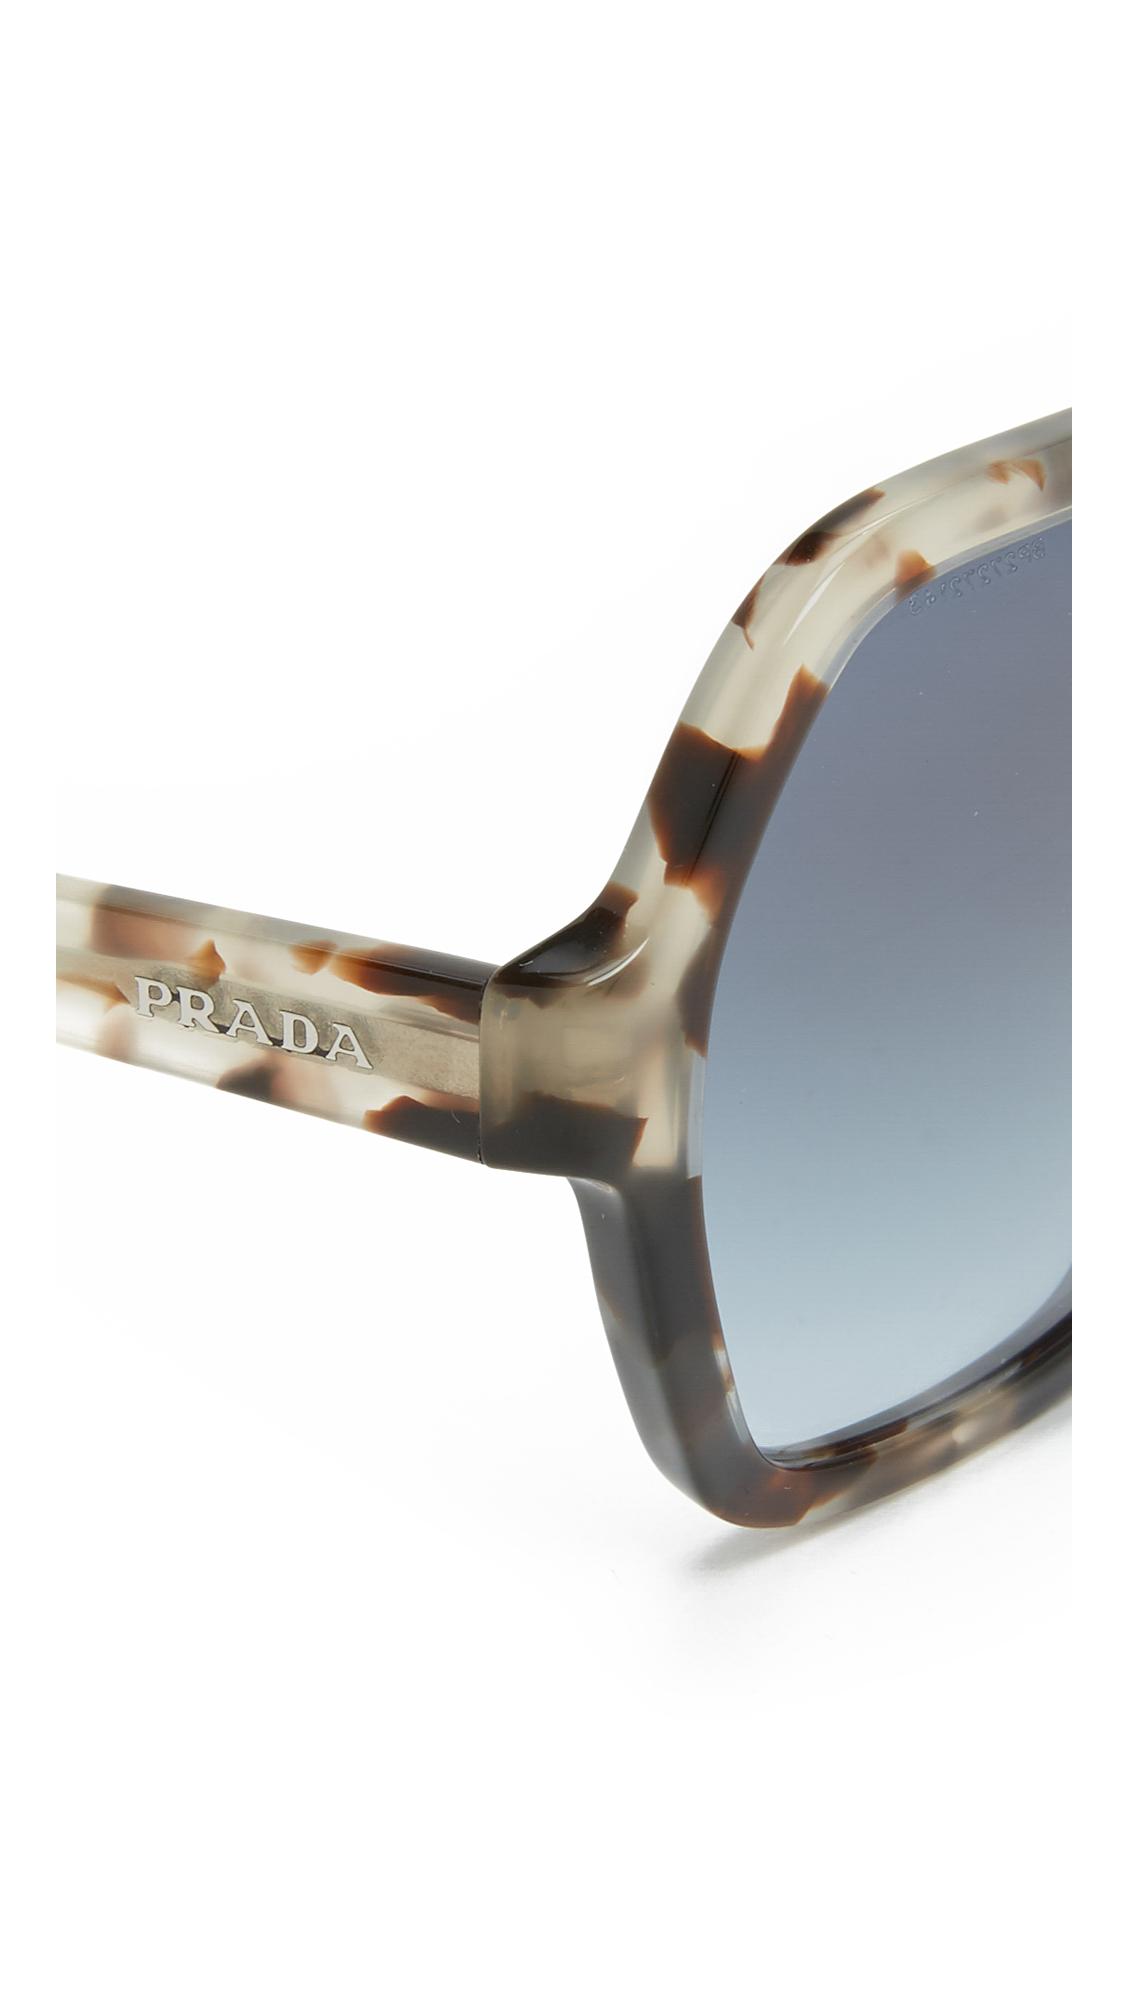 prada bag cheap - Prada Angular Oversized Sunglasses in Brown (Spotted Opal Brown ...